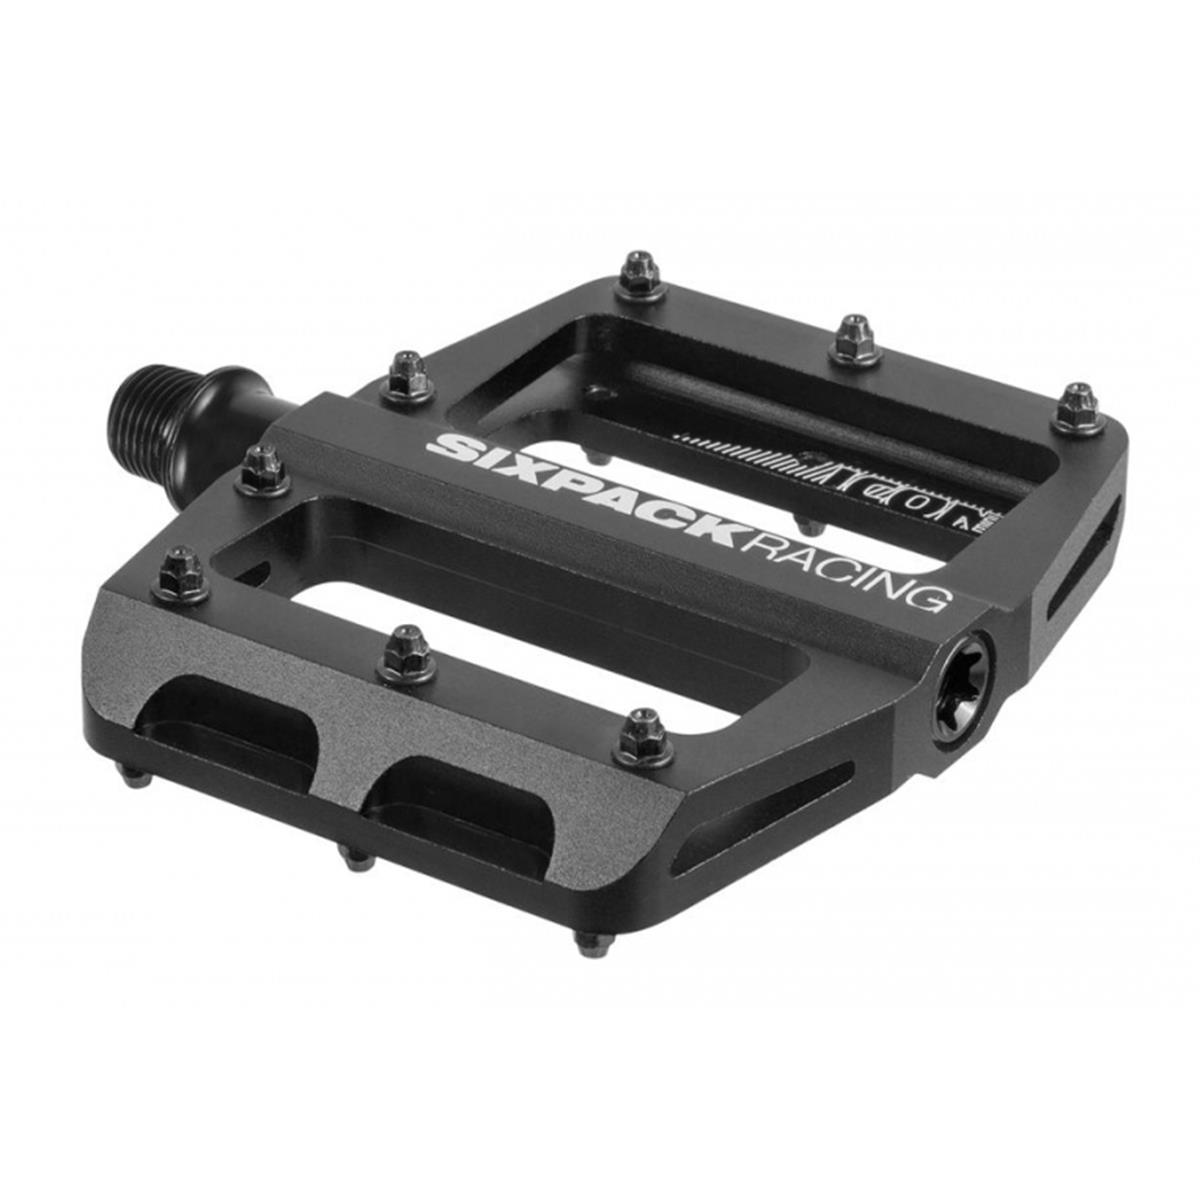 Sixpack Plattform-Pedal Icon Mini Schwarz, 85x100 mm, 32 Pins, 1 Paar